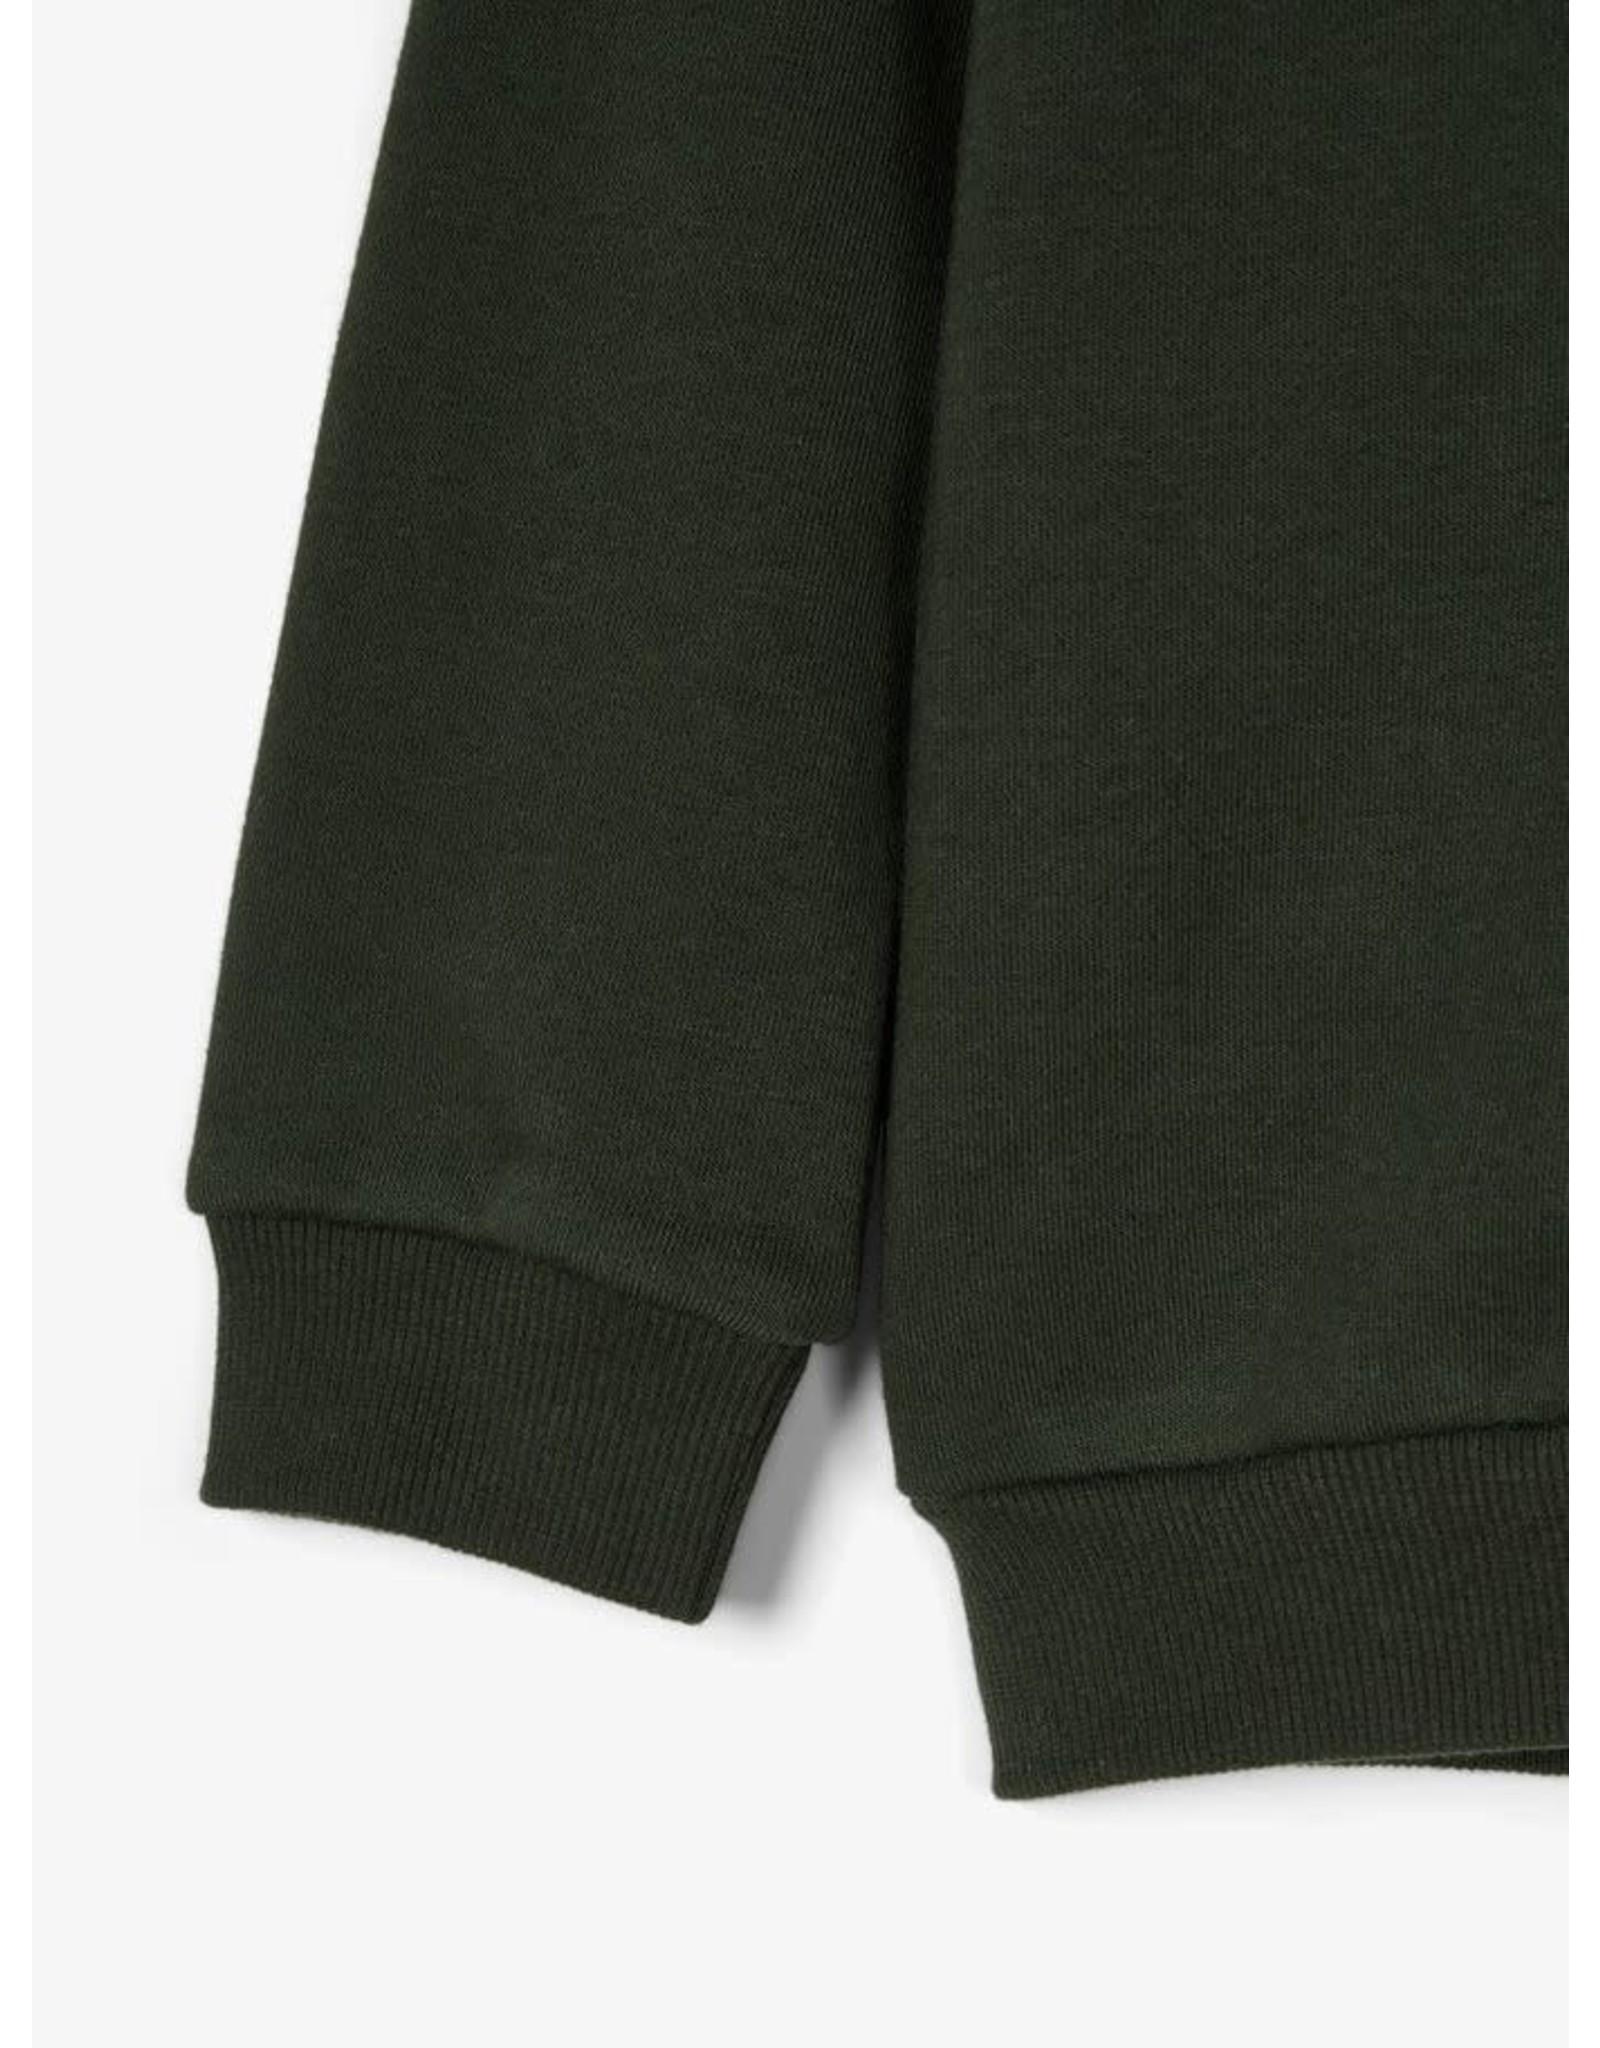 Name It Donkergroene sweatstof jogging trui